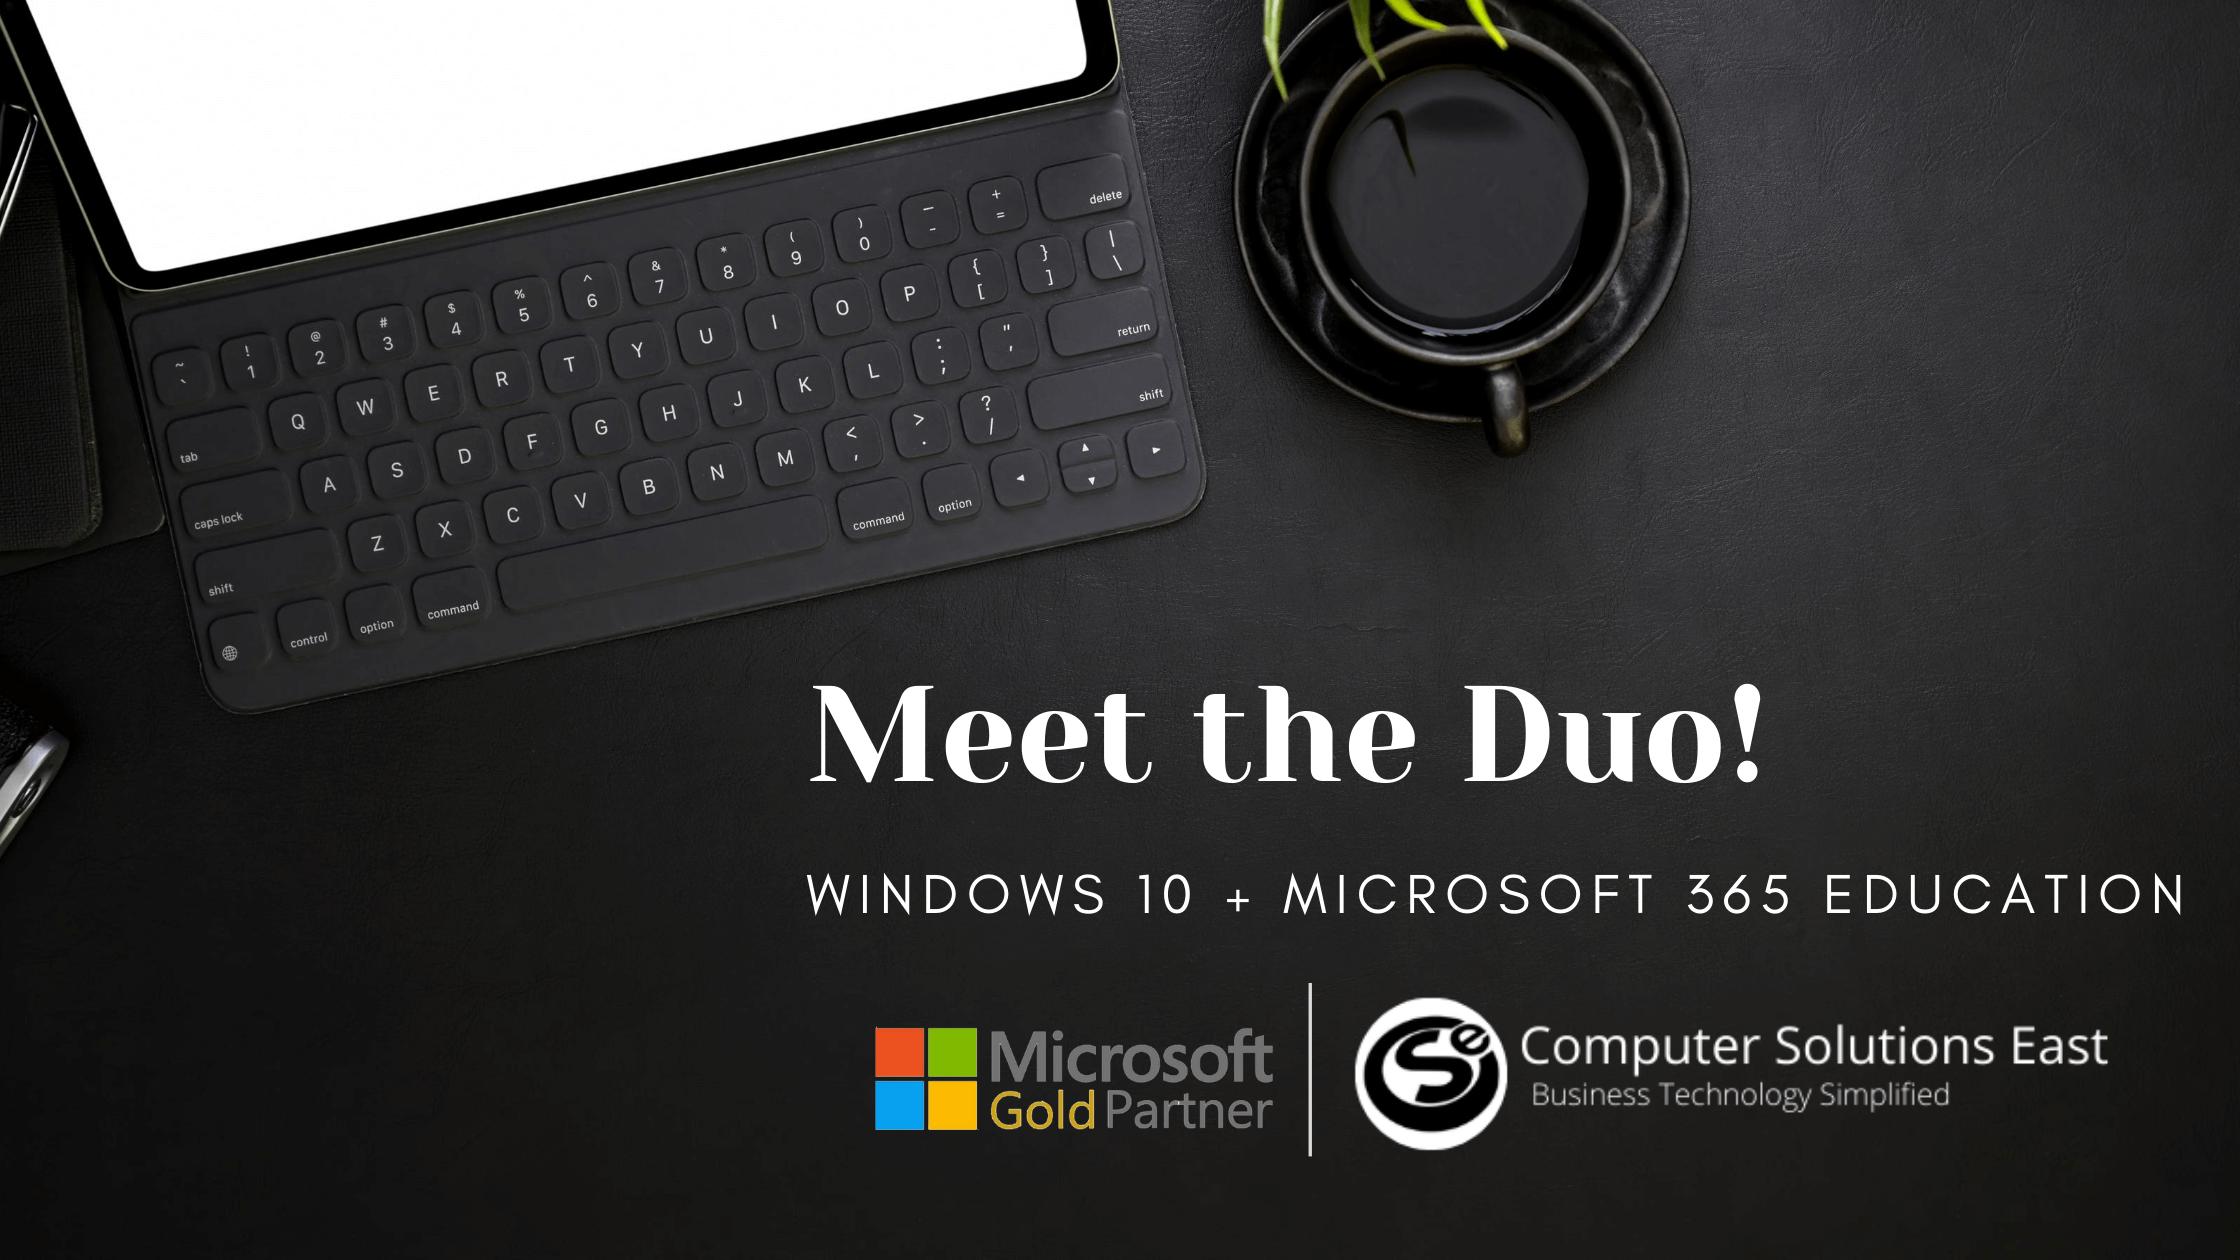 Microsoft-365-and-windows-10-duo